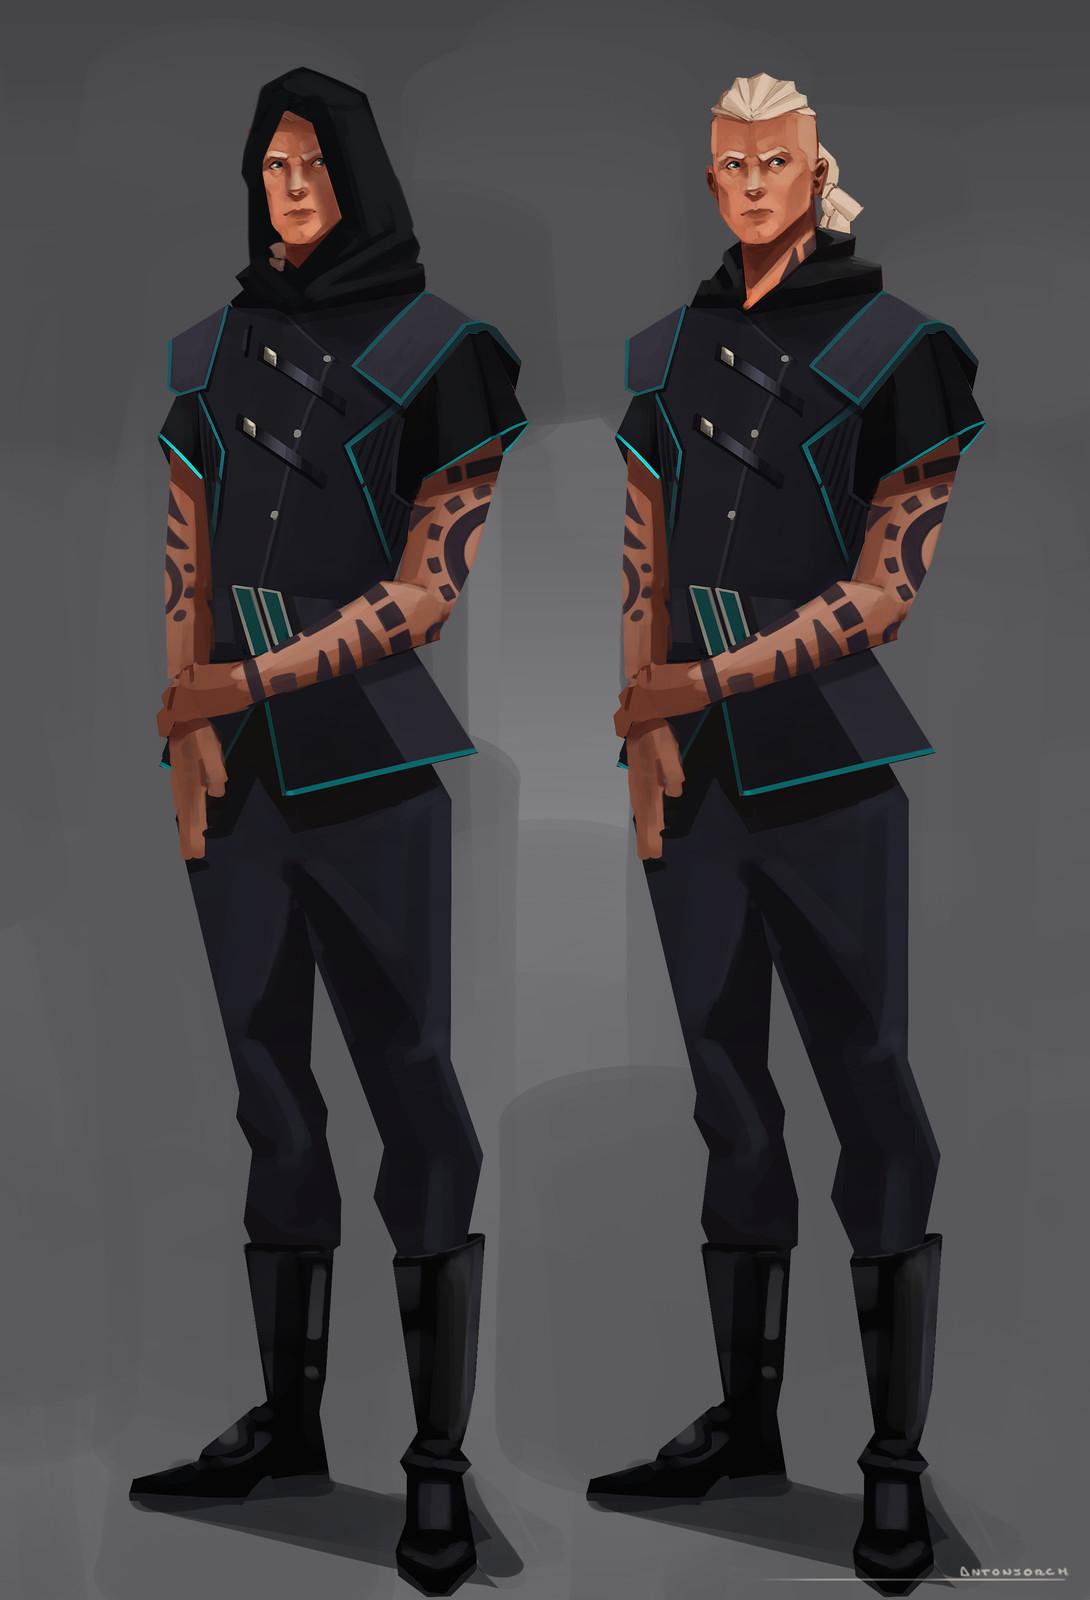 Cyan Character Design - Ae'Ra Sunburn